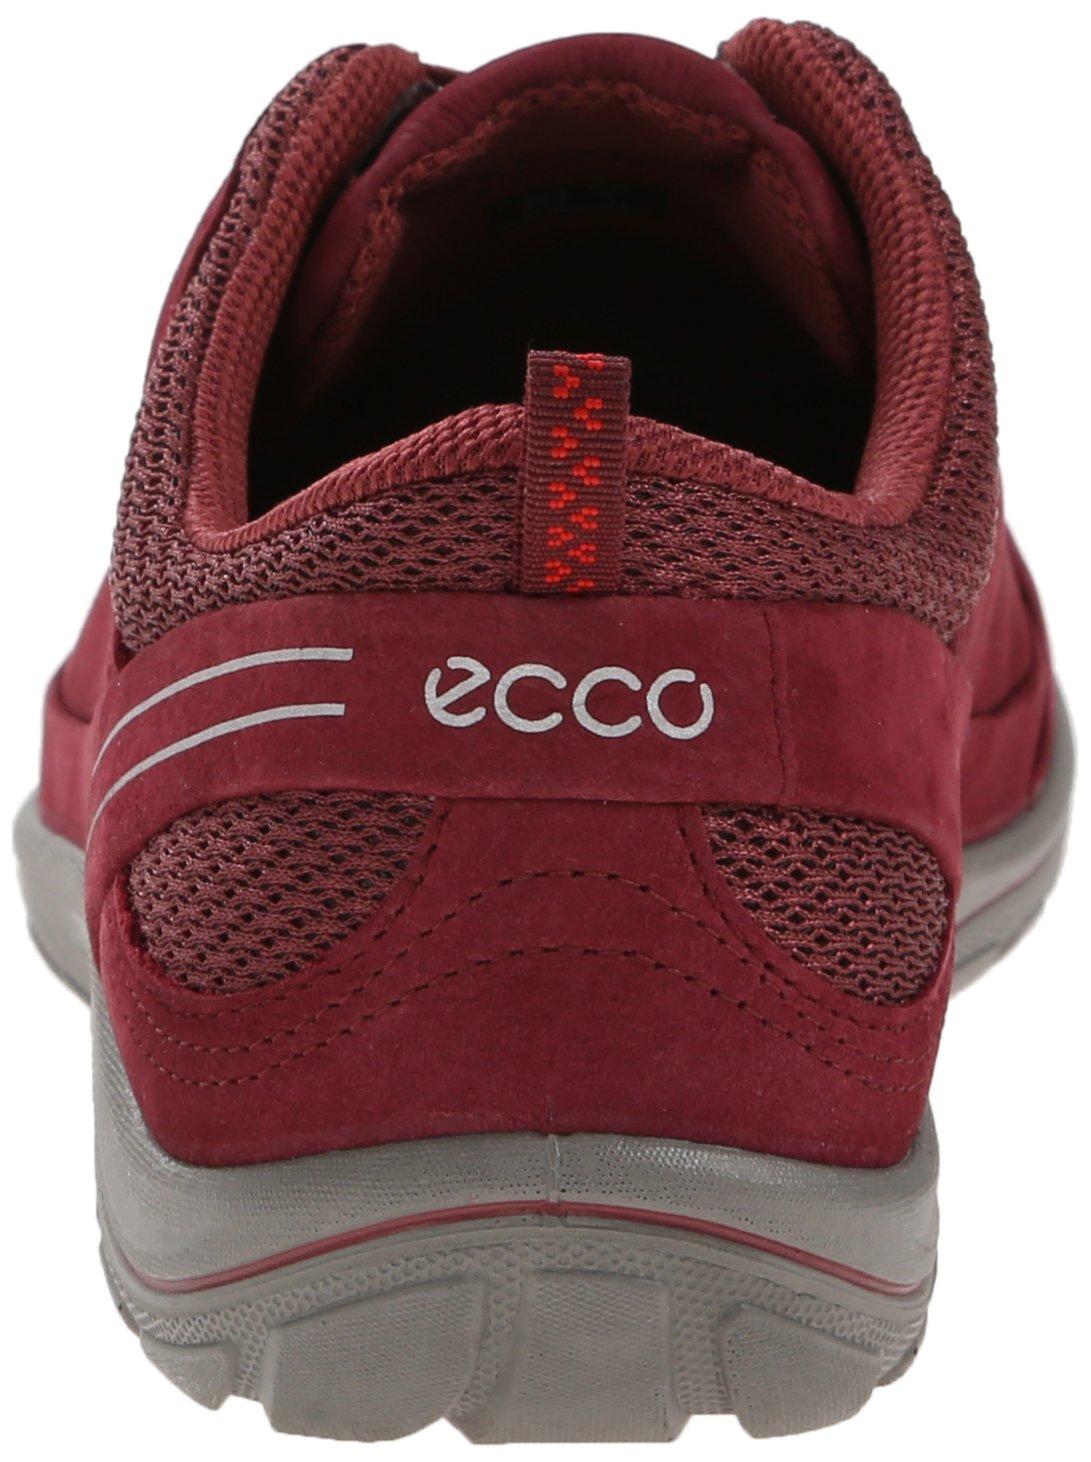 ECCO Women's Arizona Tie Shoe B00OARN3OY 38 EU/7-7.5 M US|Morillo